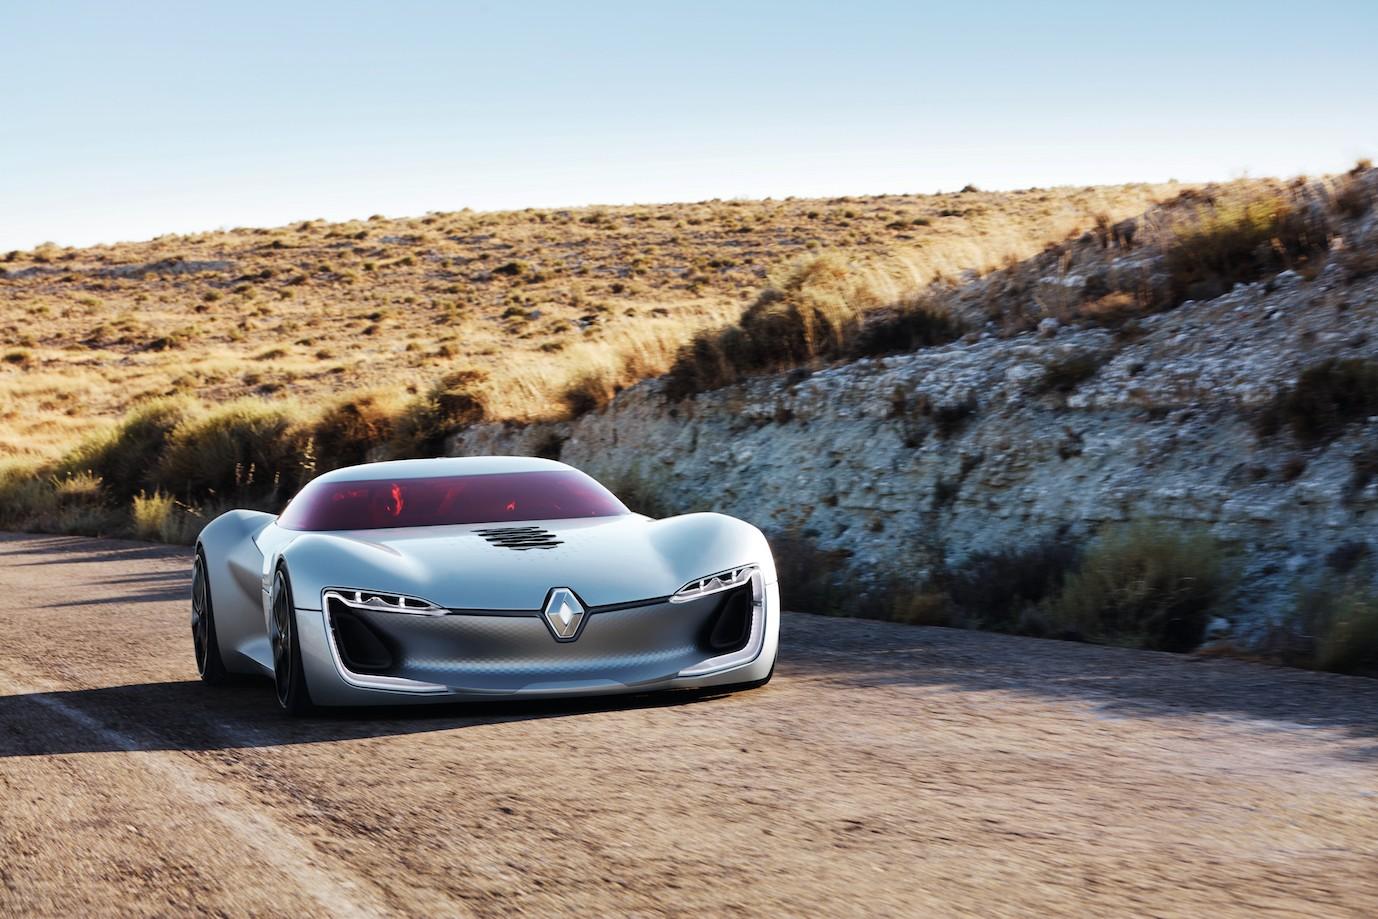 Renault's Trezor An Electric Car Fantasy